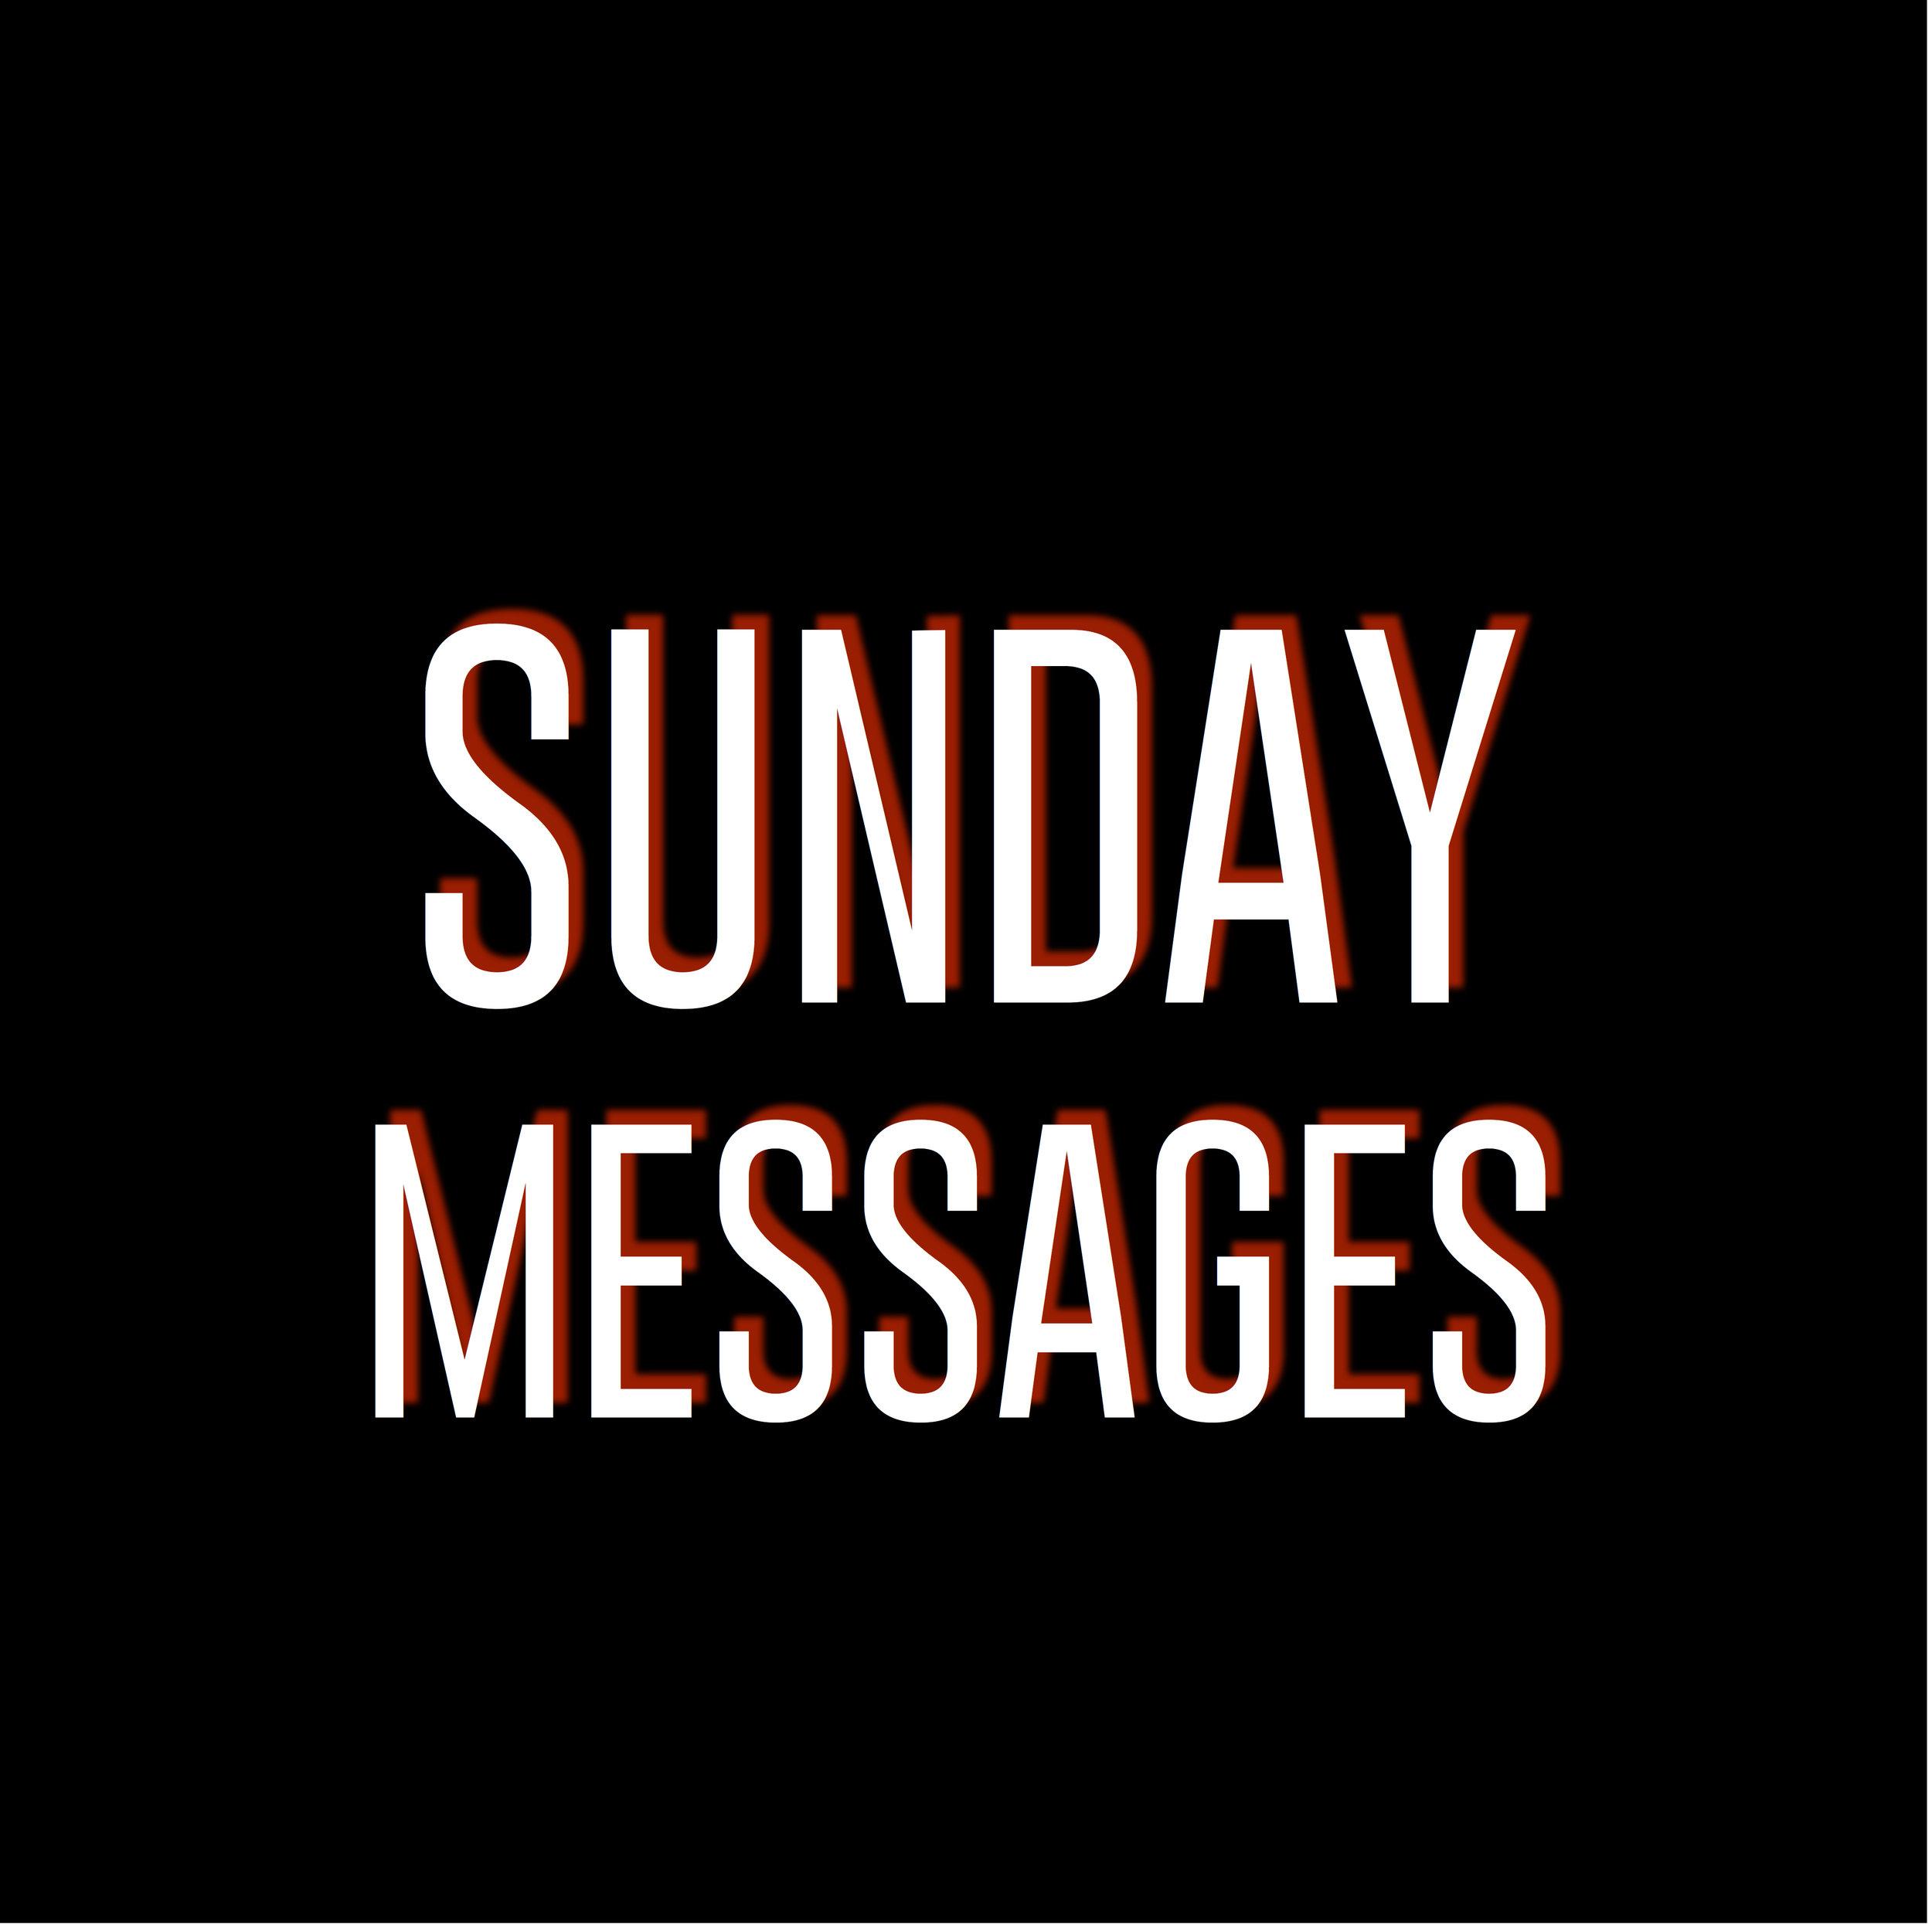 Sunday Messages.jpeg